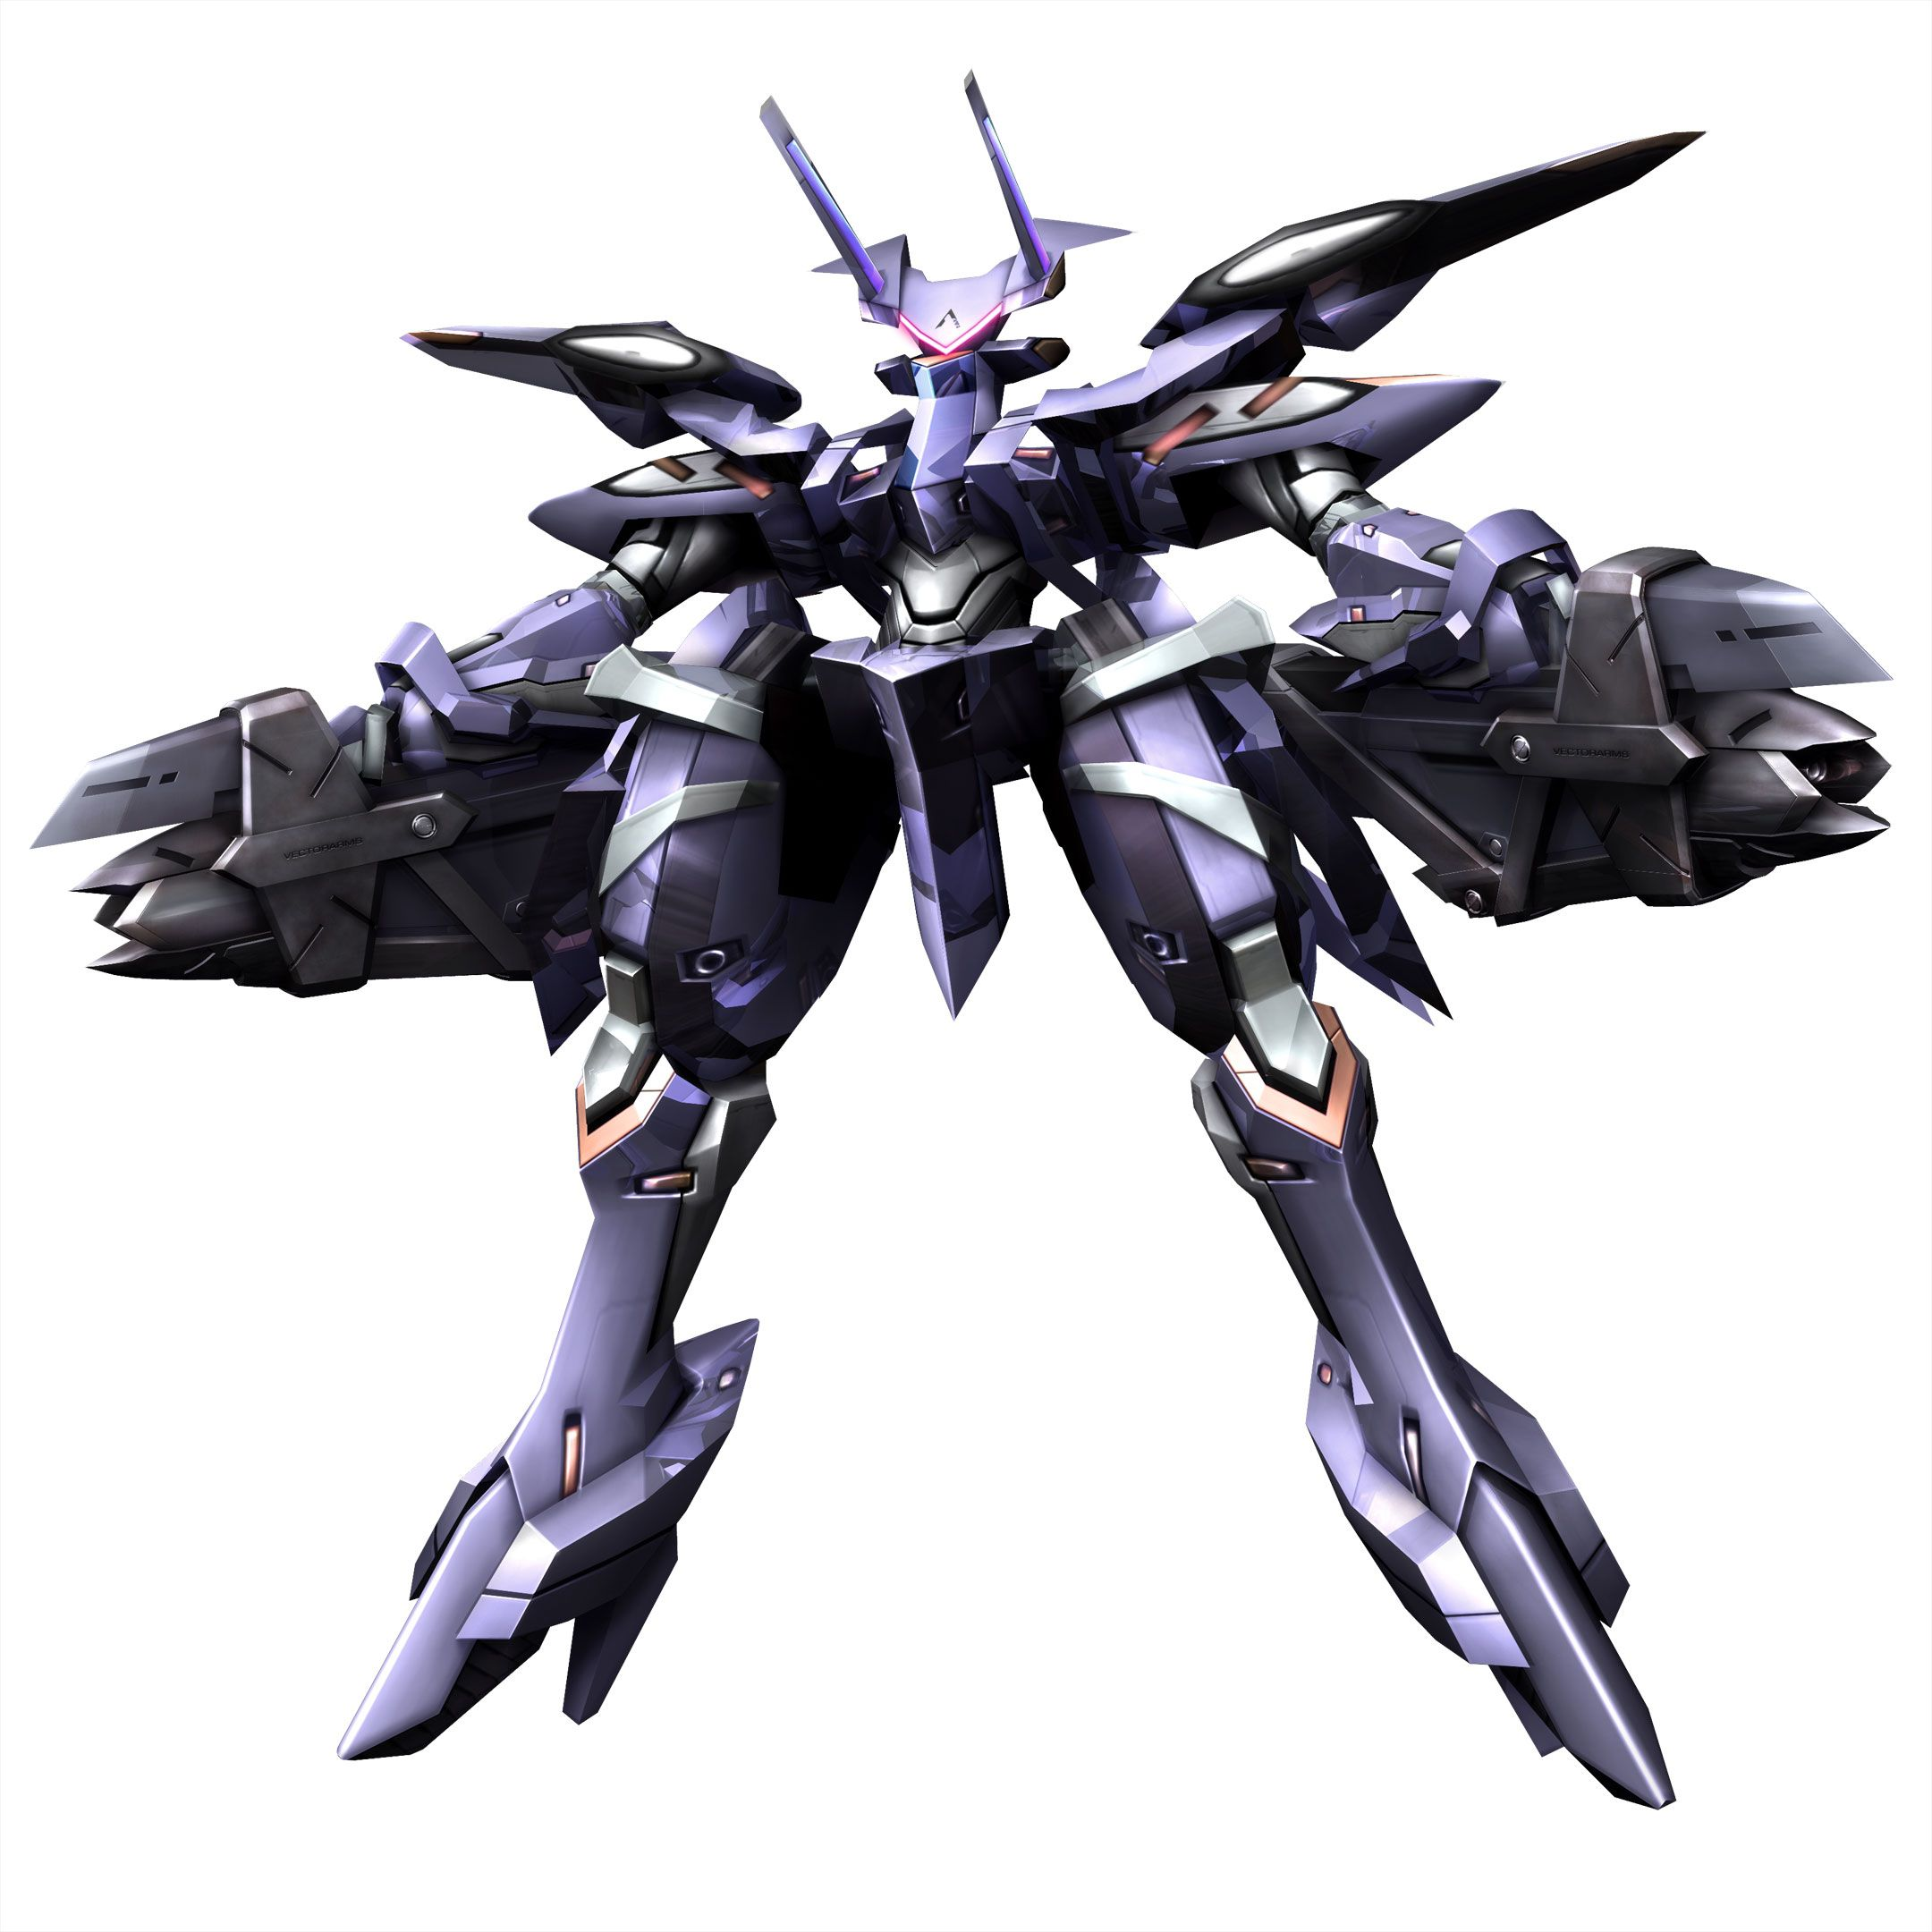 Xenosaga III Mecha's Render character More Character